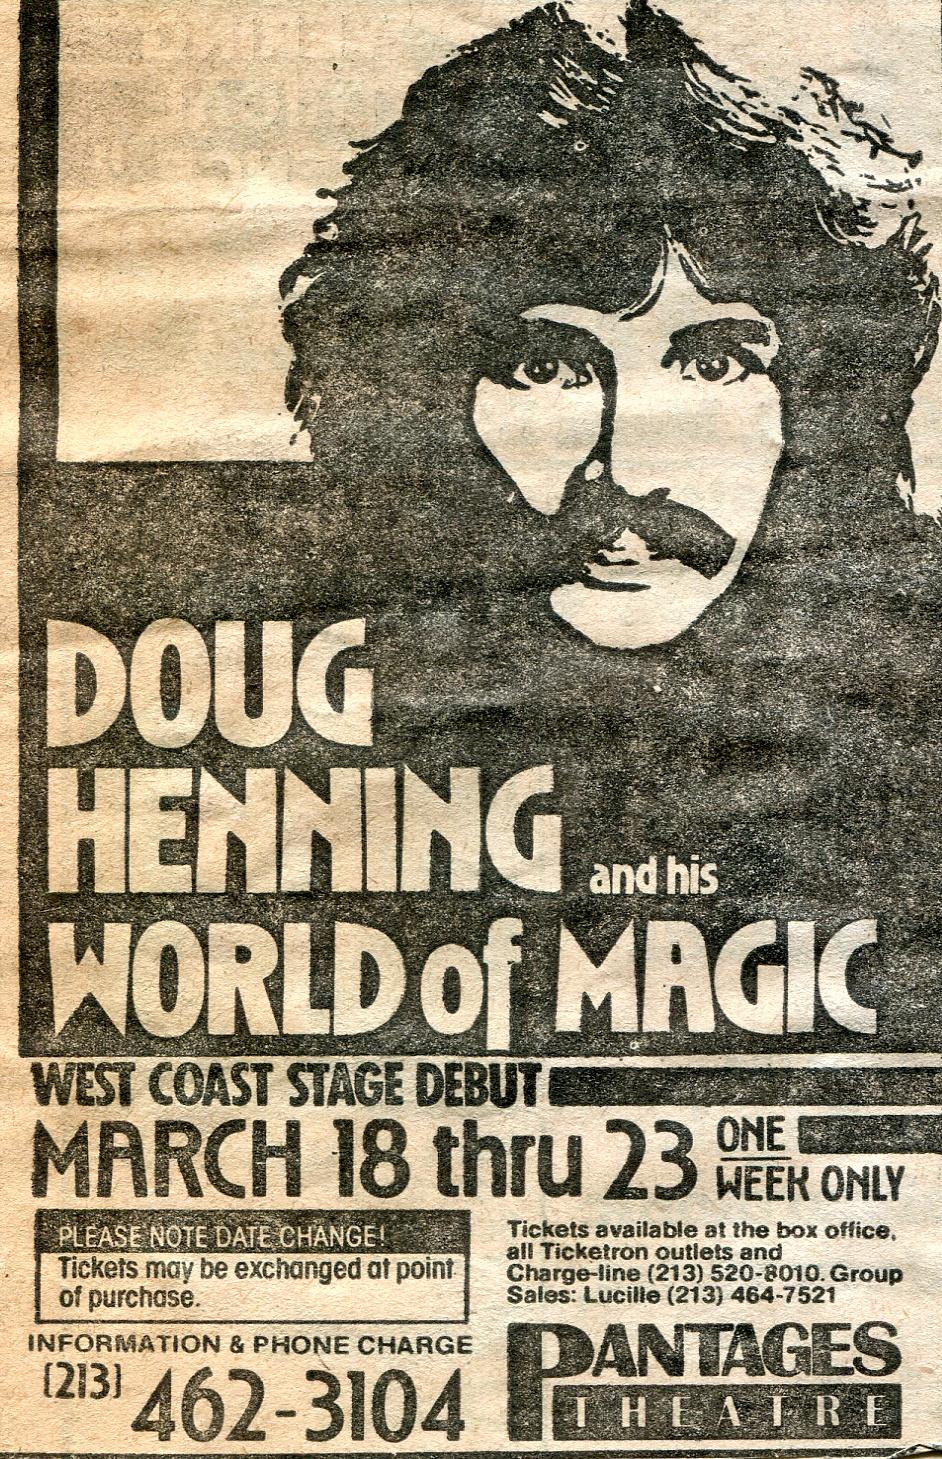 Doug Henning Newspaper Ad1980.cdr.jpg